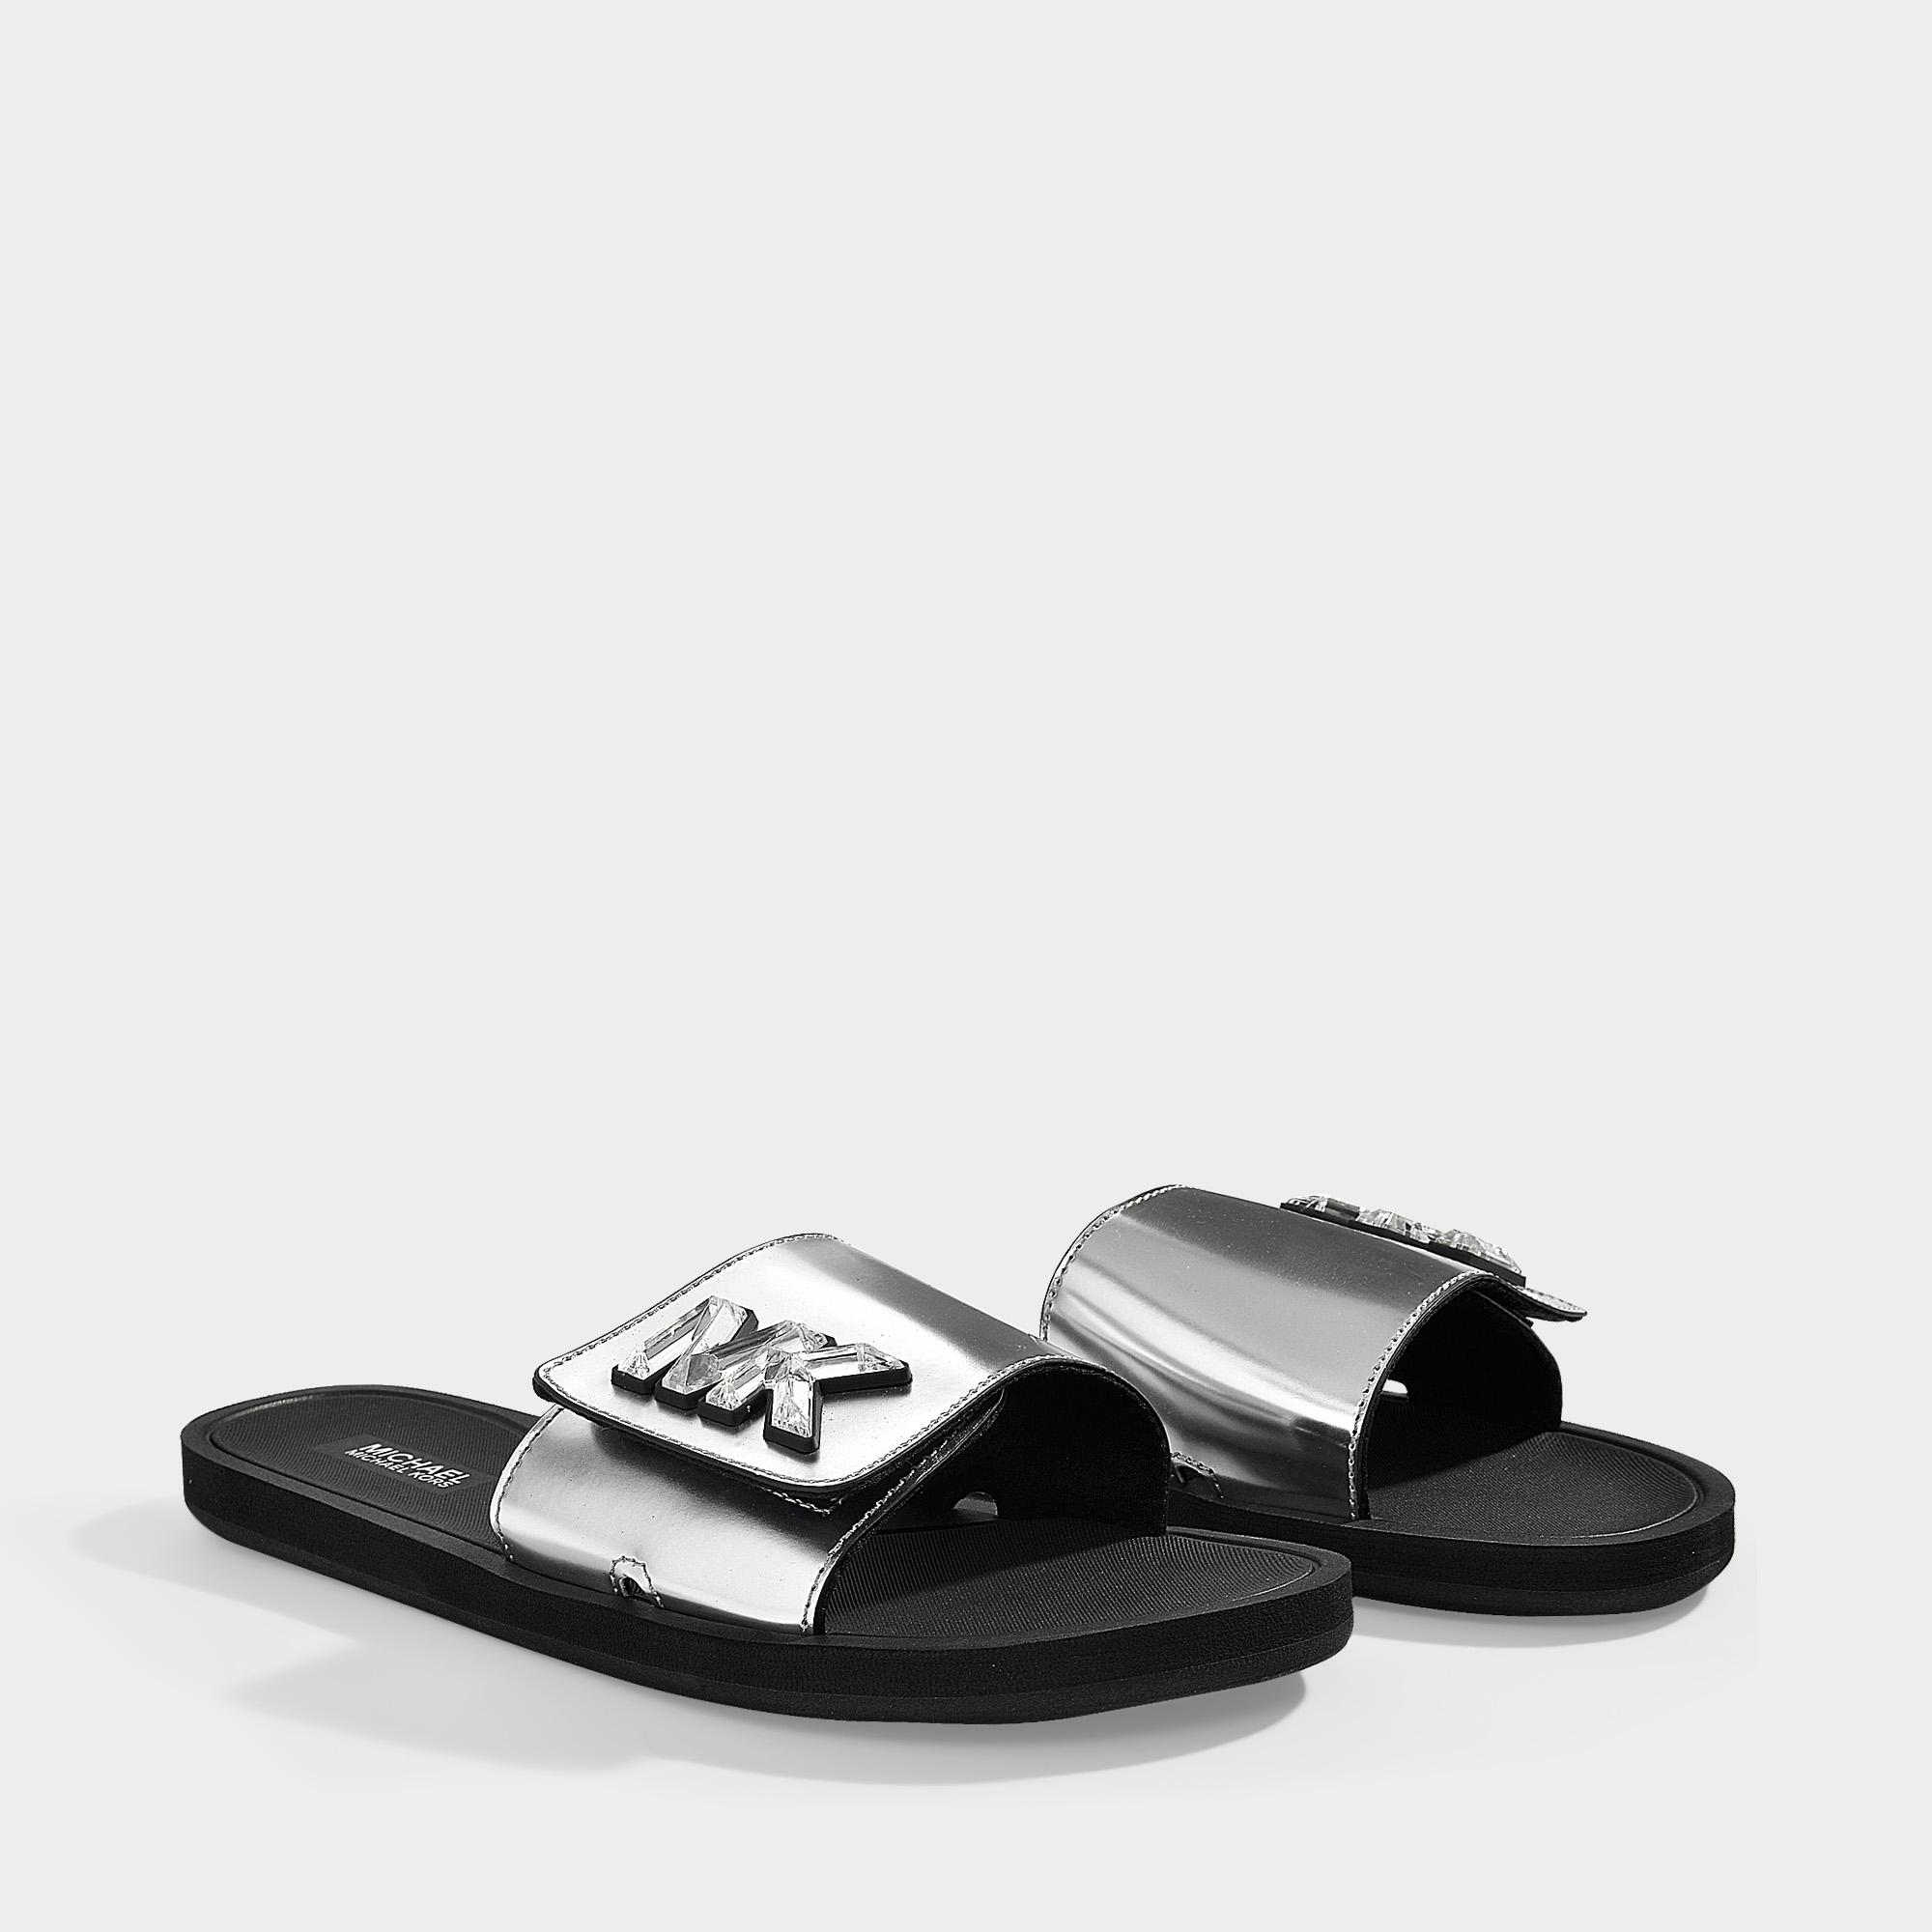 a055b9dd9c9b MICHAEL Michael Kors - Gray Mk Slides In Silver Mirror Metallic Material  And Crystals - Lyst. View fullscreen